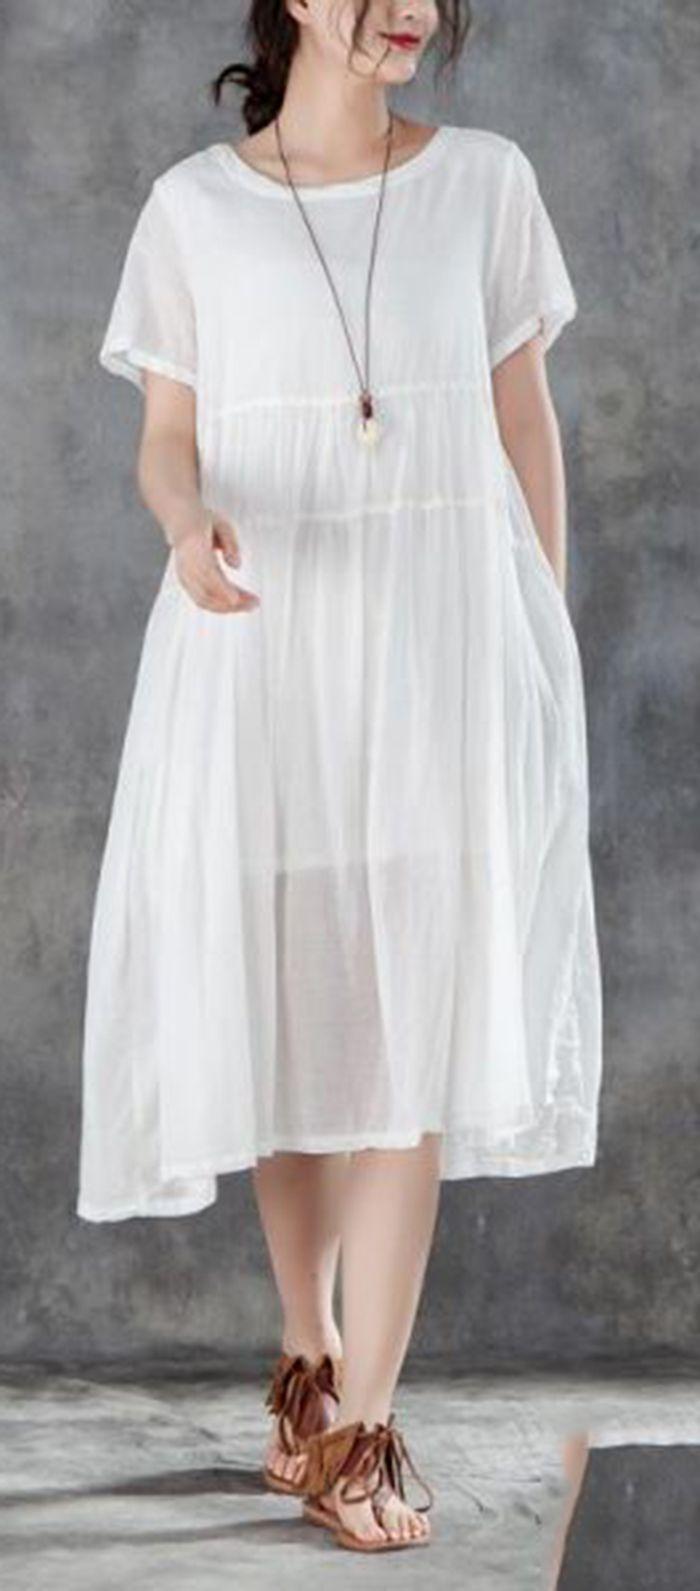 Women Cotton Dresses Plus Size Clothing Casual Summer Round Neck Short Sleeve White Dress Women Cotton Dress White Short Sleeve Dress Casual Summer Dresses [ 1591 x 700 Pixel ]